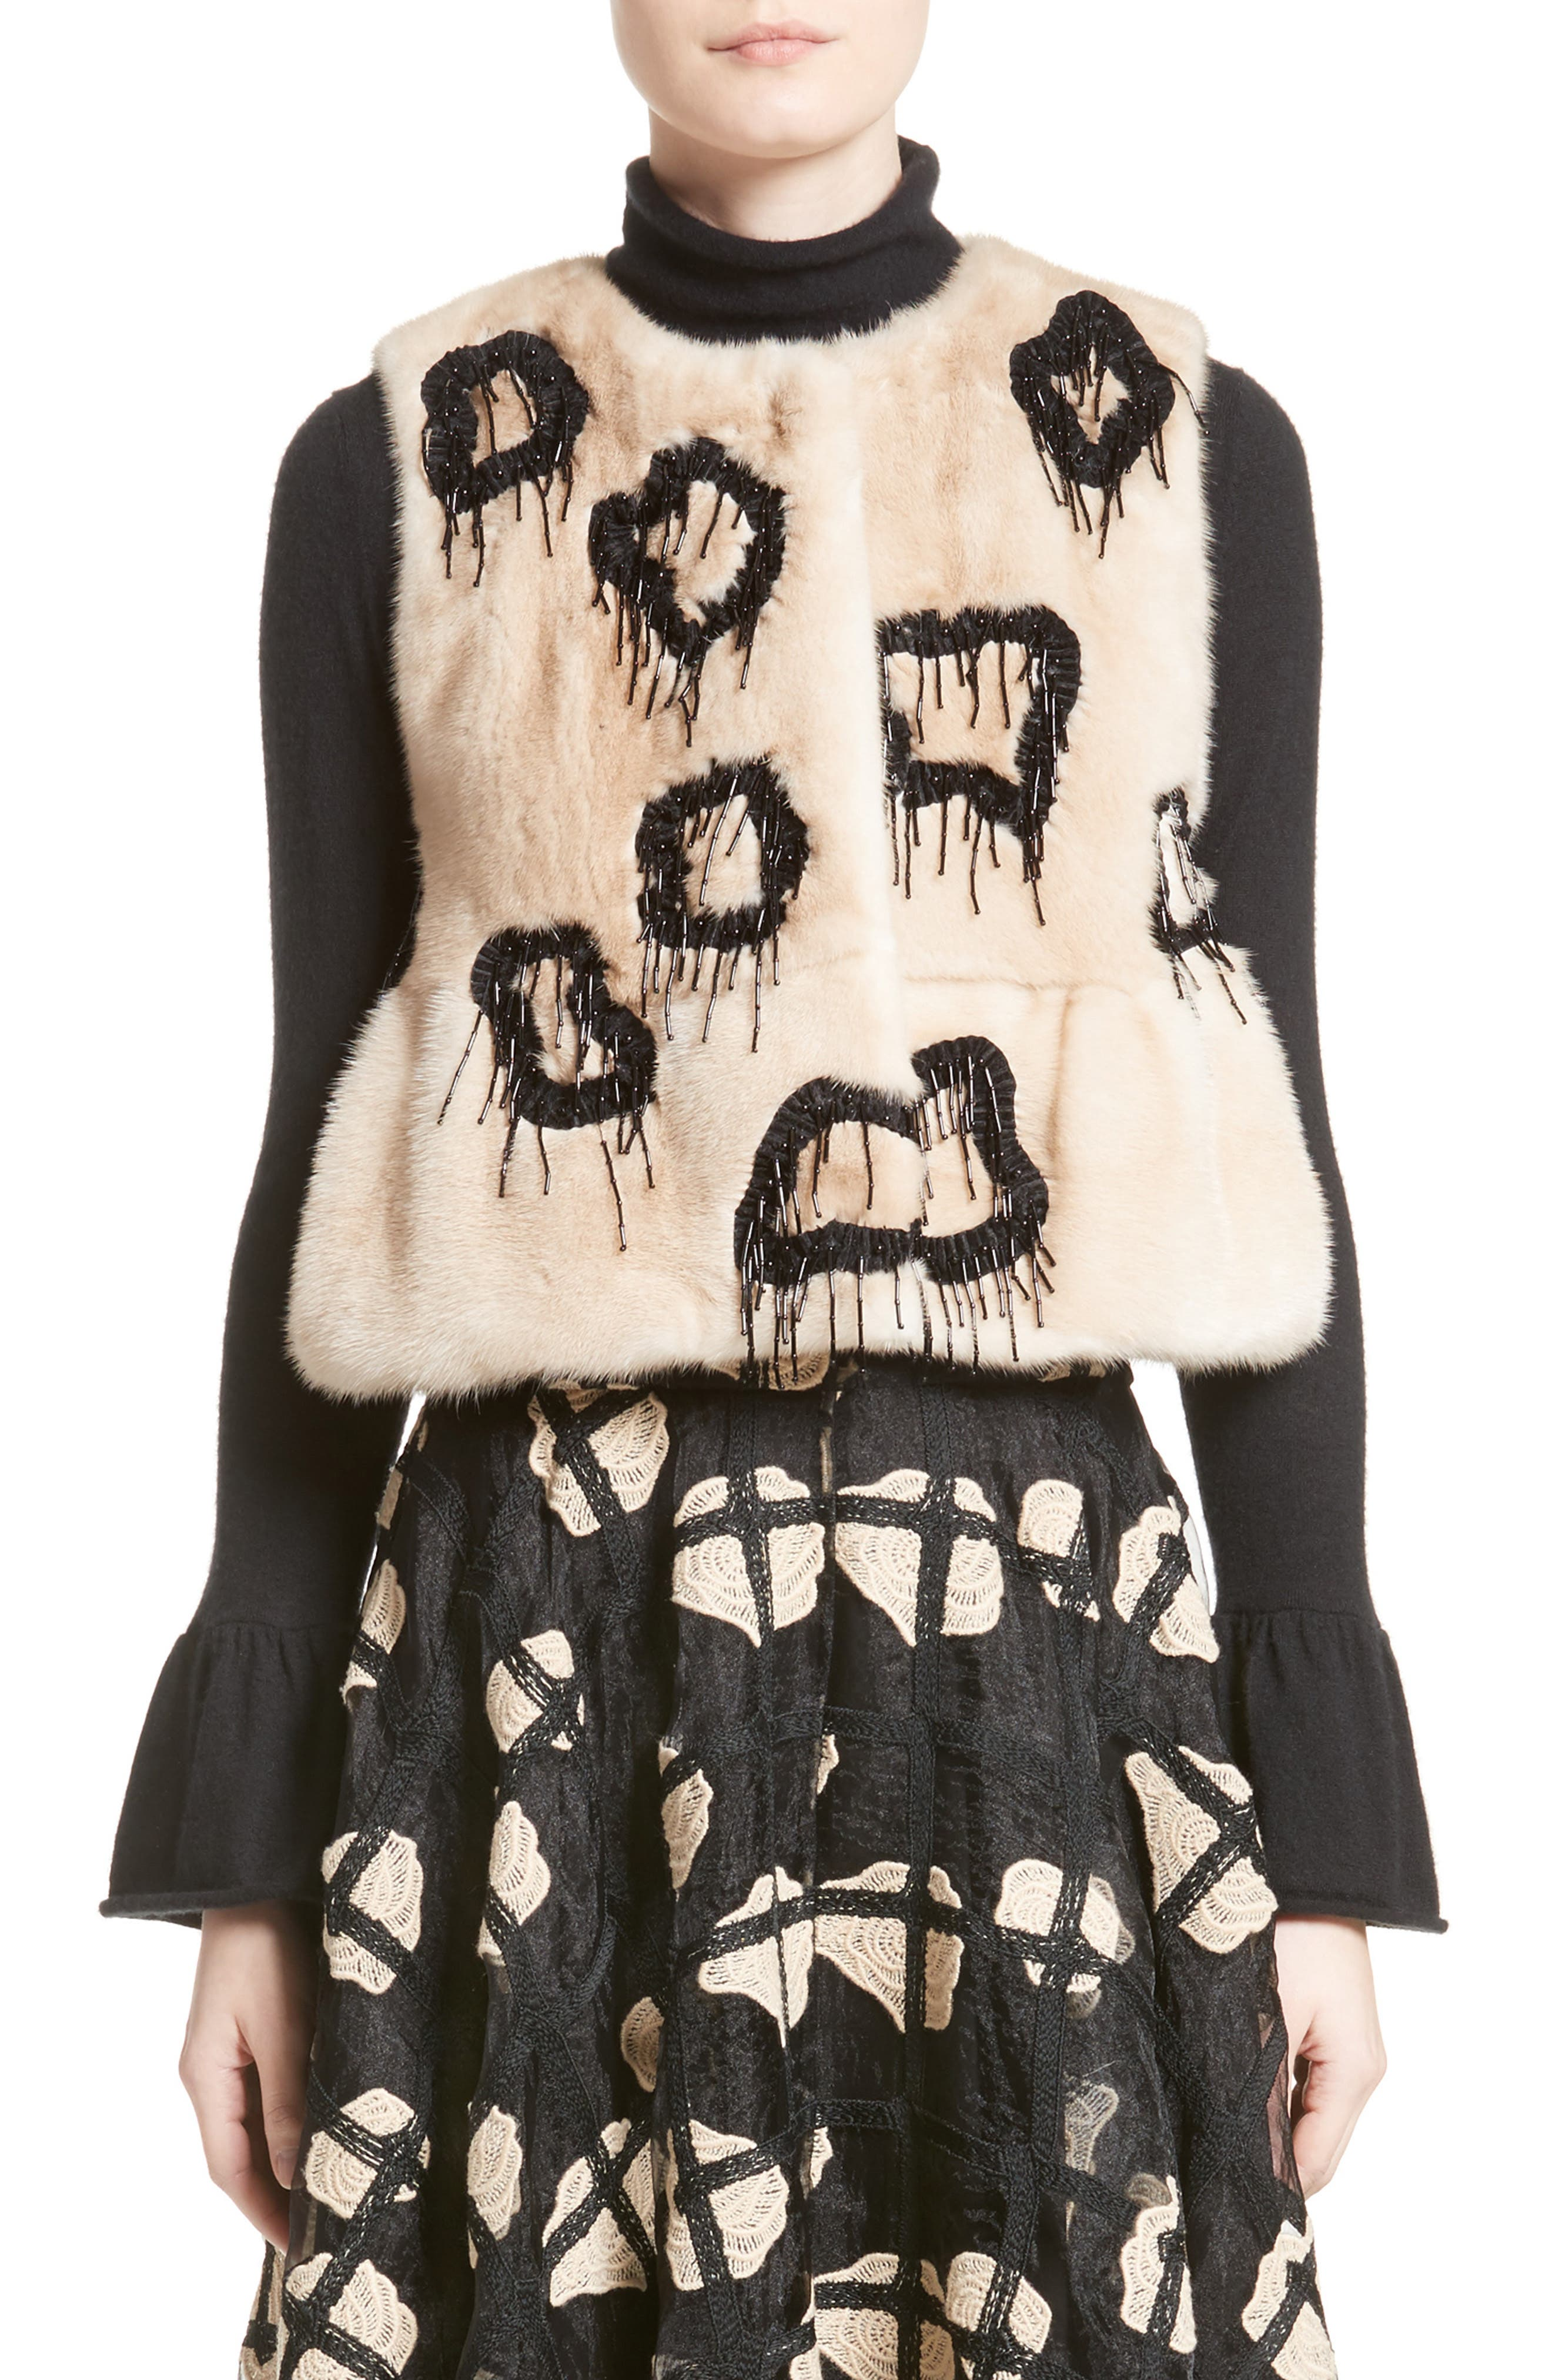 Beaded Genuine Mink Fur Peplum Vest,                             Main thumbnail 1, color,                             Beige